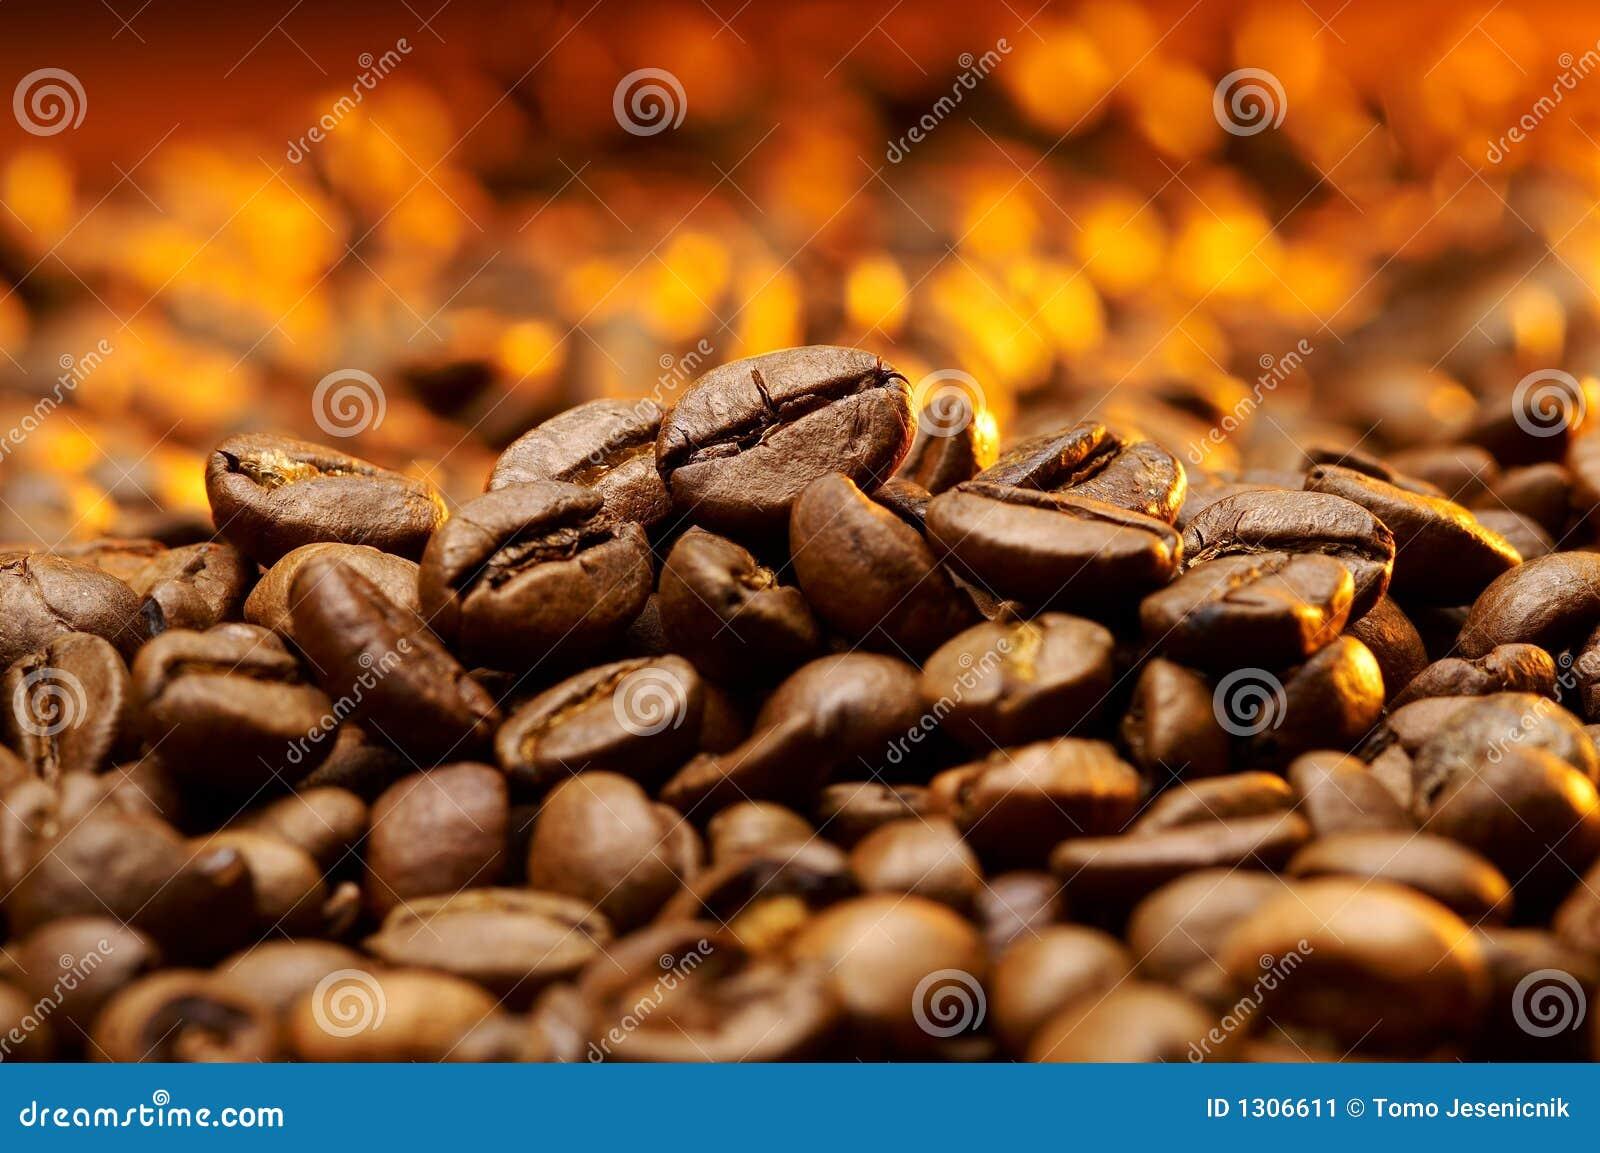 A detail of coffe grains